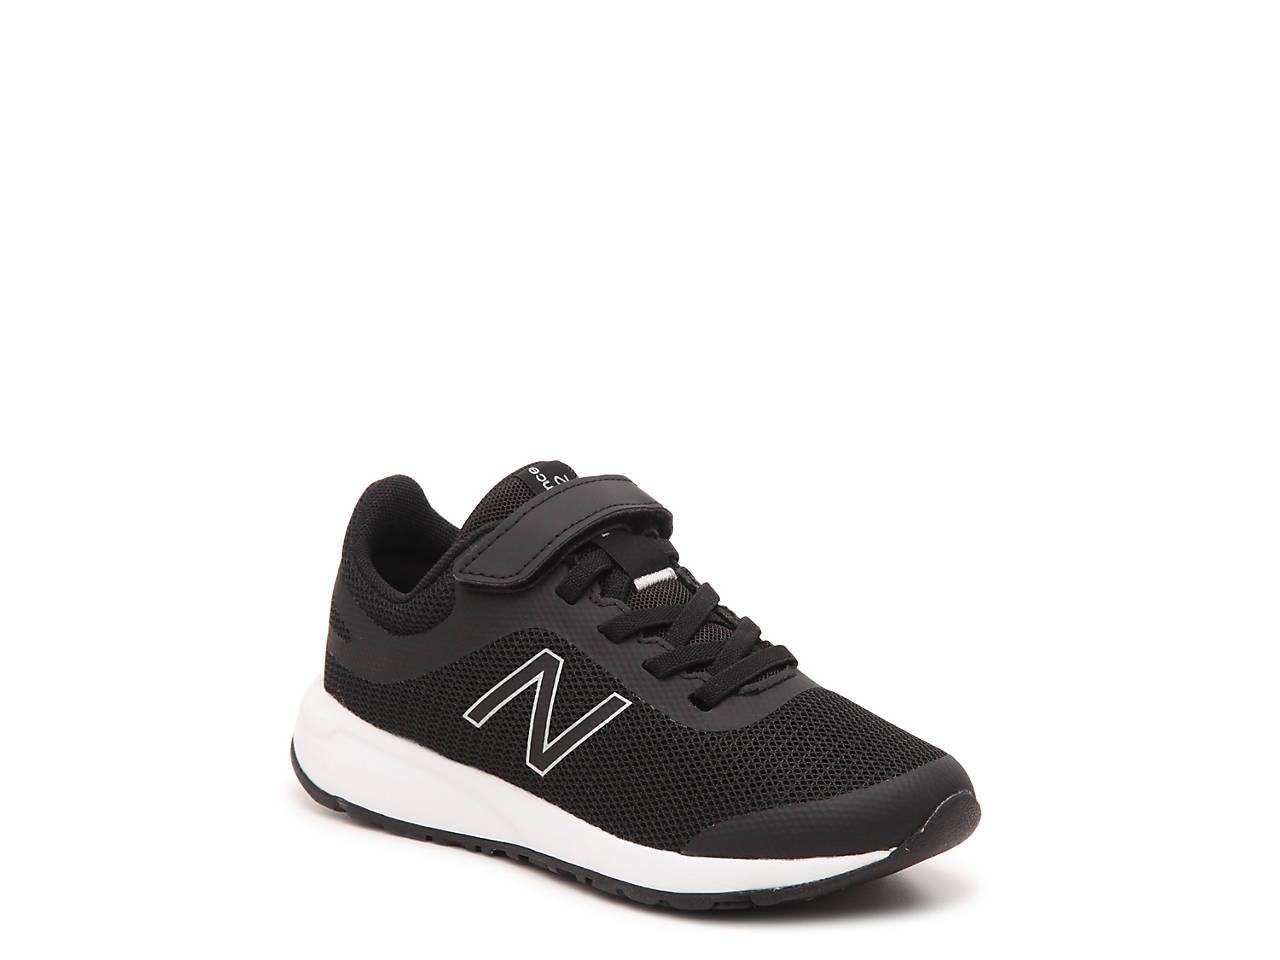 676debec2456c New Balance 455 v2 Sneaker - Kids' Kids Shoes | DSW